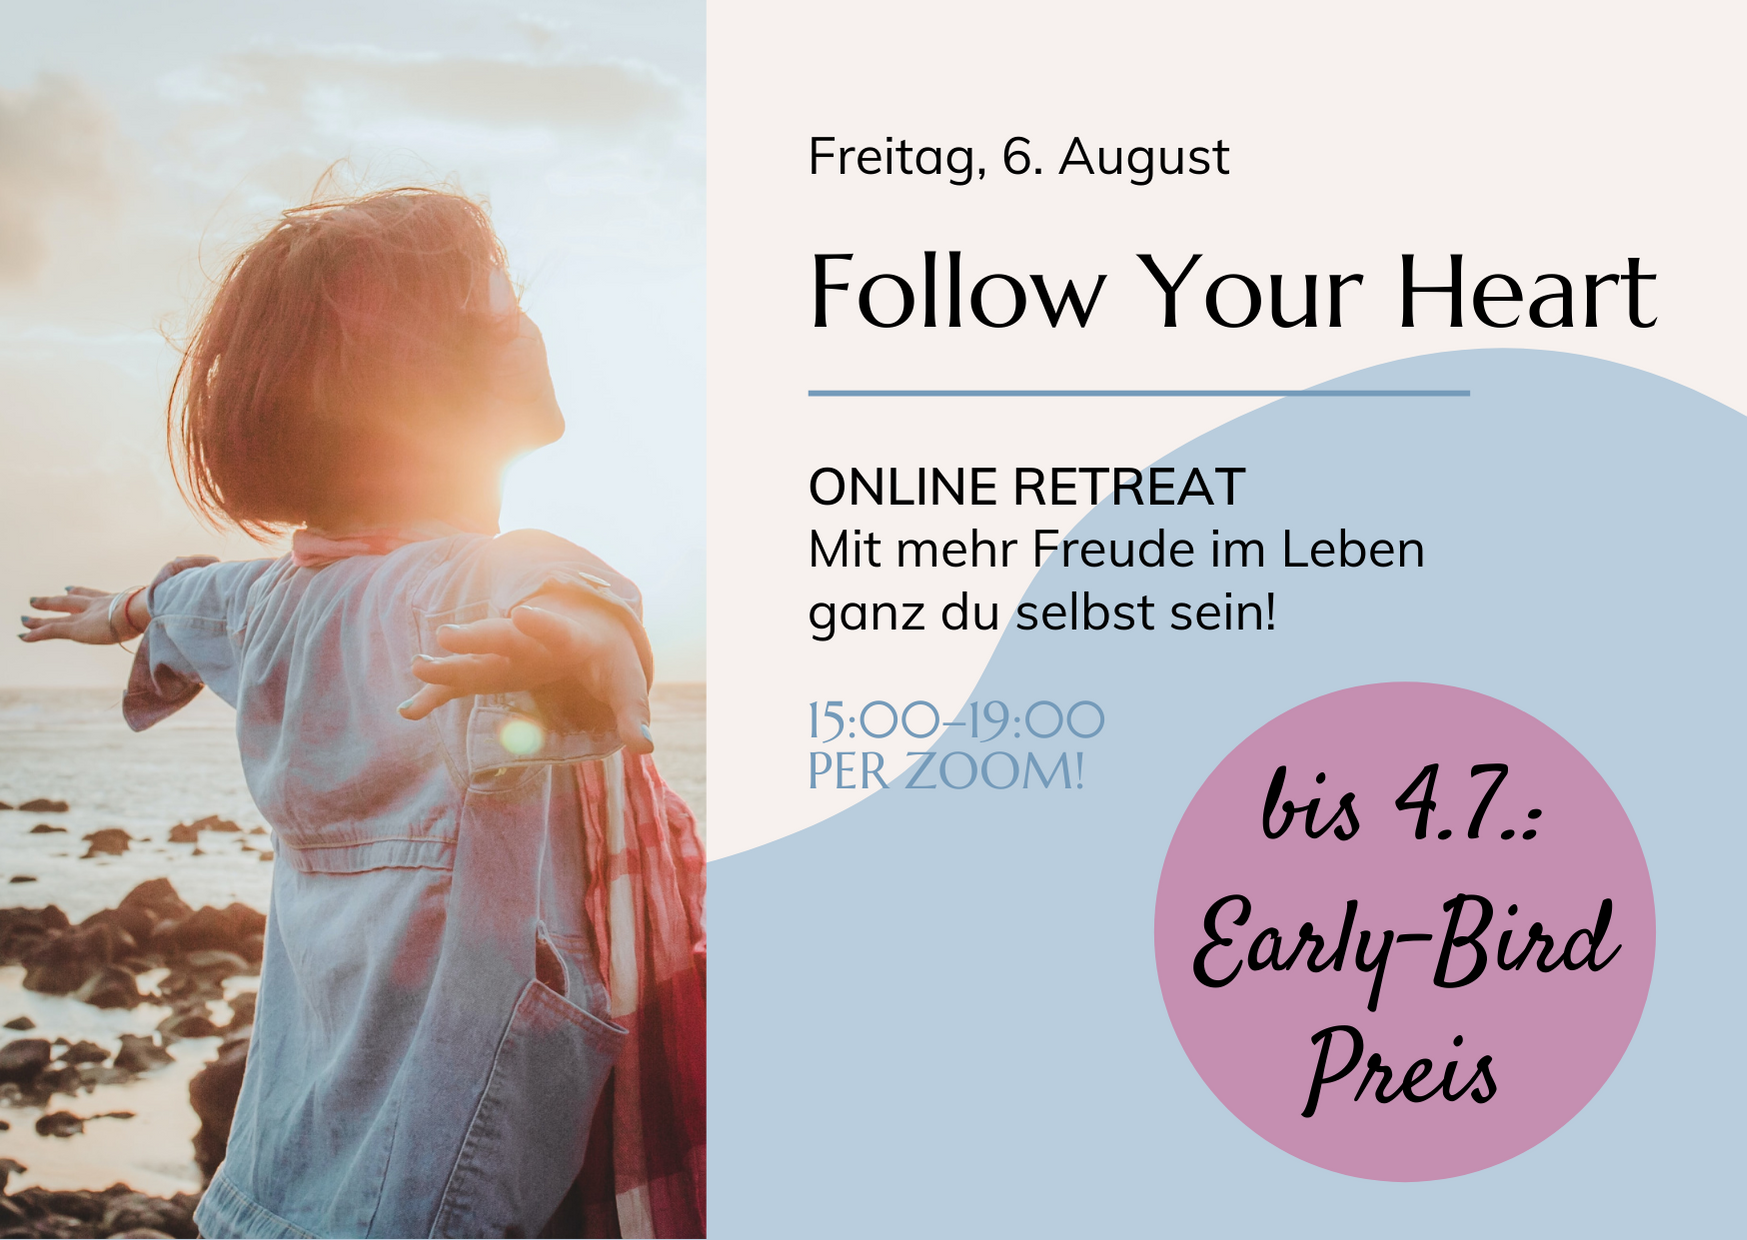 STUDIO ICH Rita Hofmeister Online Retreat Follow Your Heart Hemma Marenzi kakaozeremonie Journaling Aroma-Yin-Yoga NEU